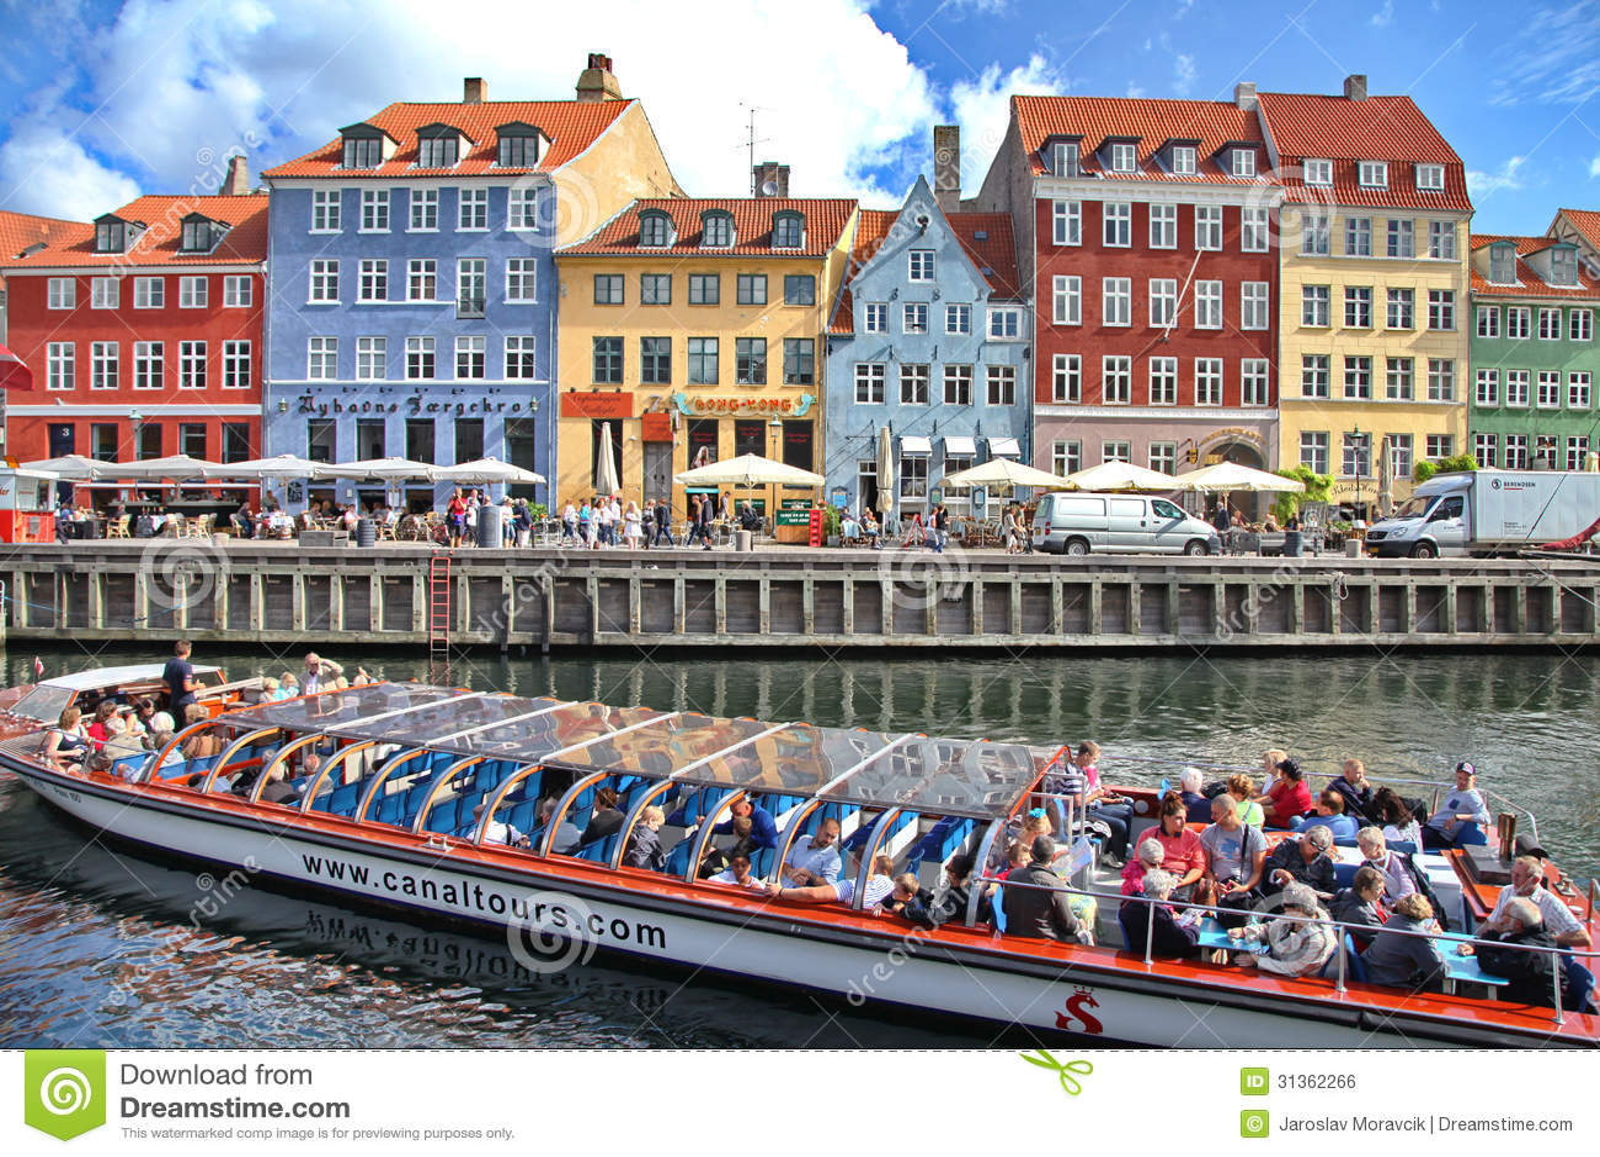 Beautiful Colorful Buildings In Copenhagen Editorial Photo - Image: 31362266